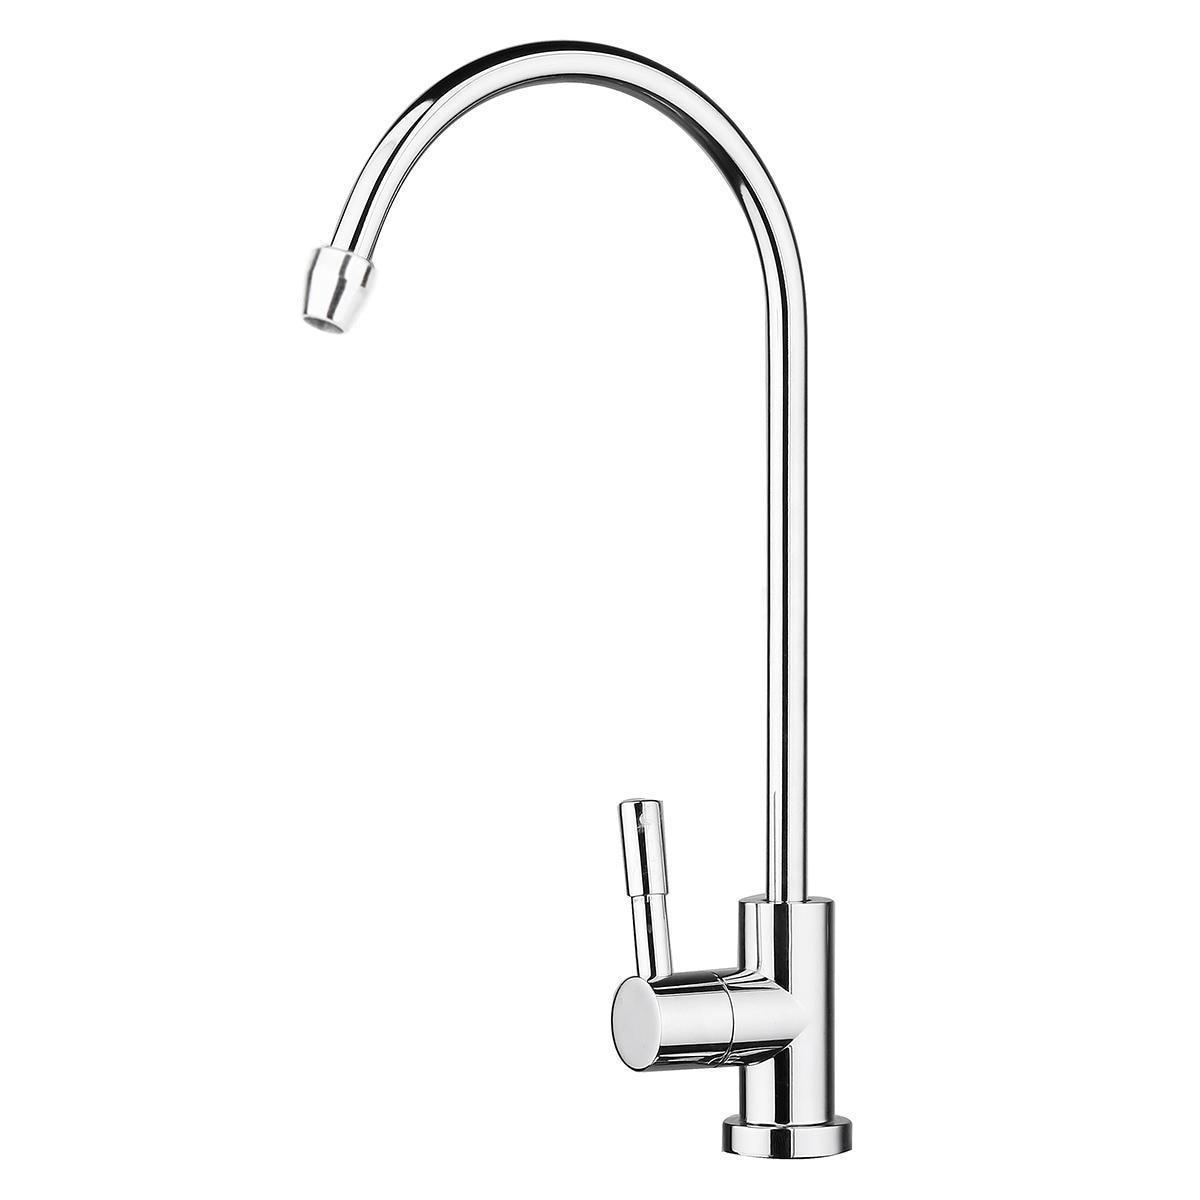 Best Modern Brushed Nickel Single Handle Kitchen Sink Dispenser ...